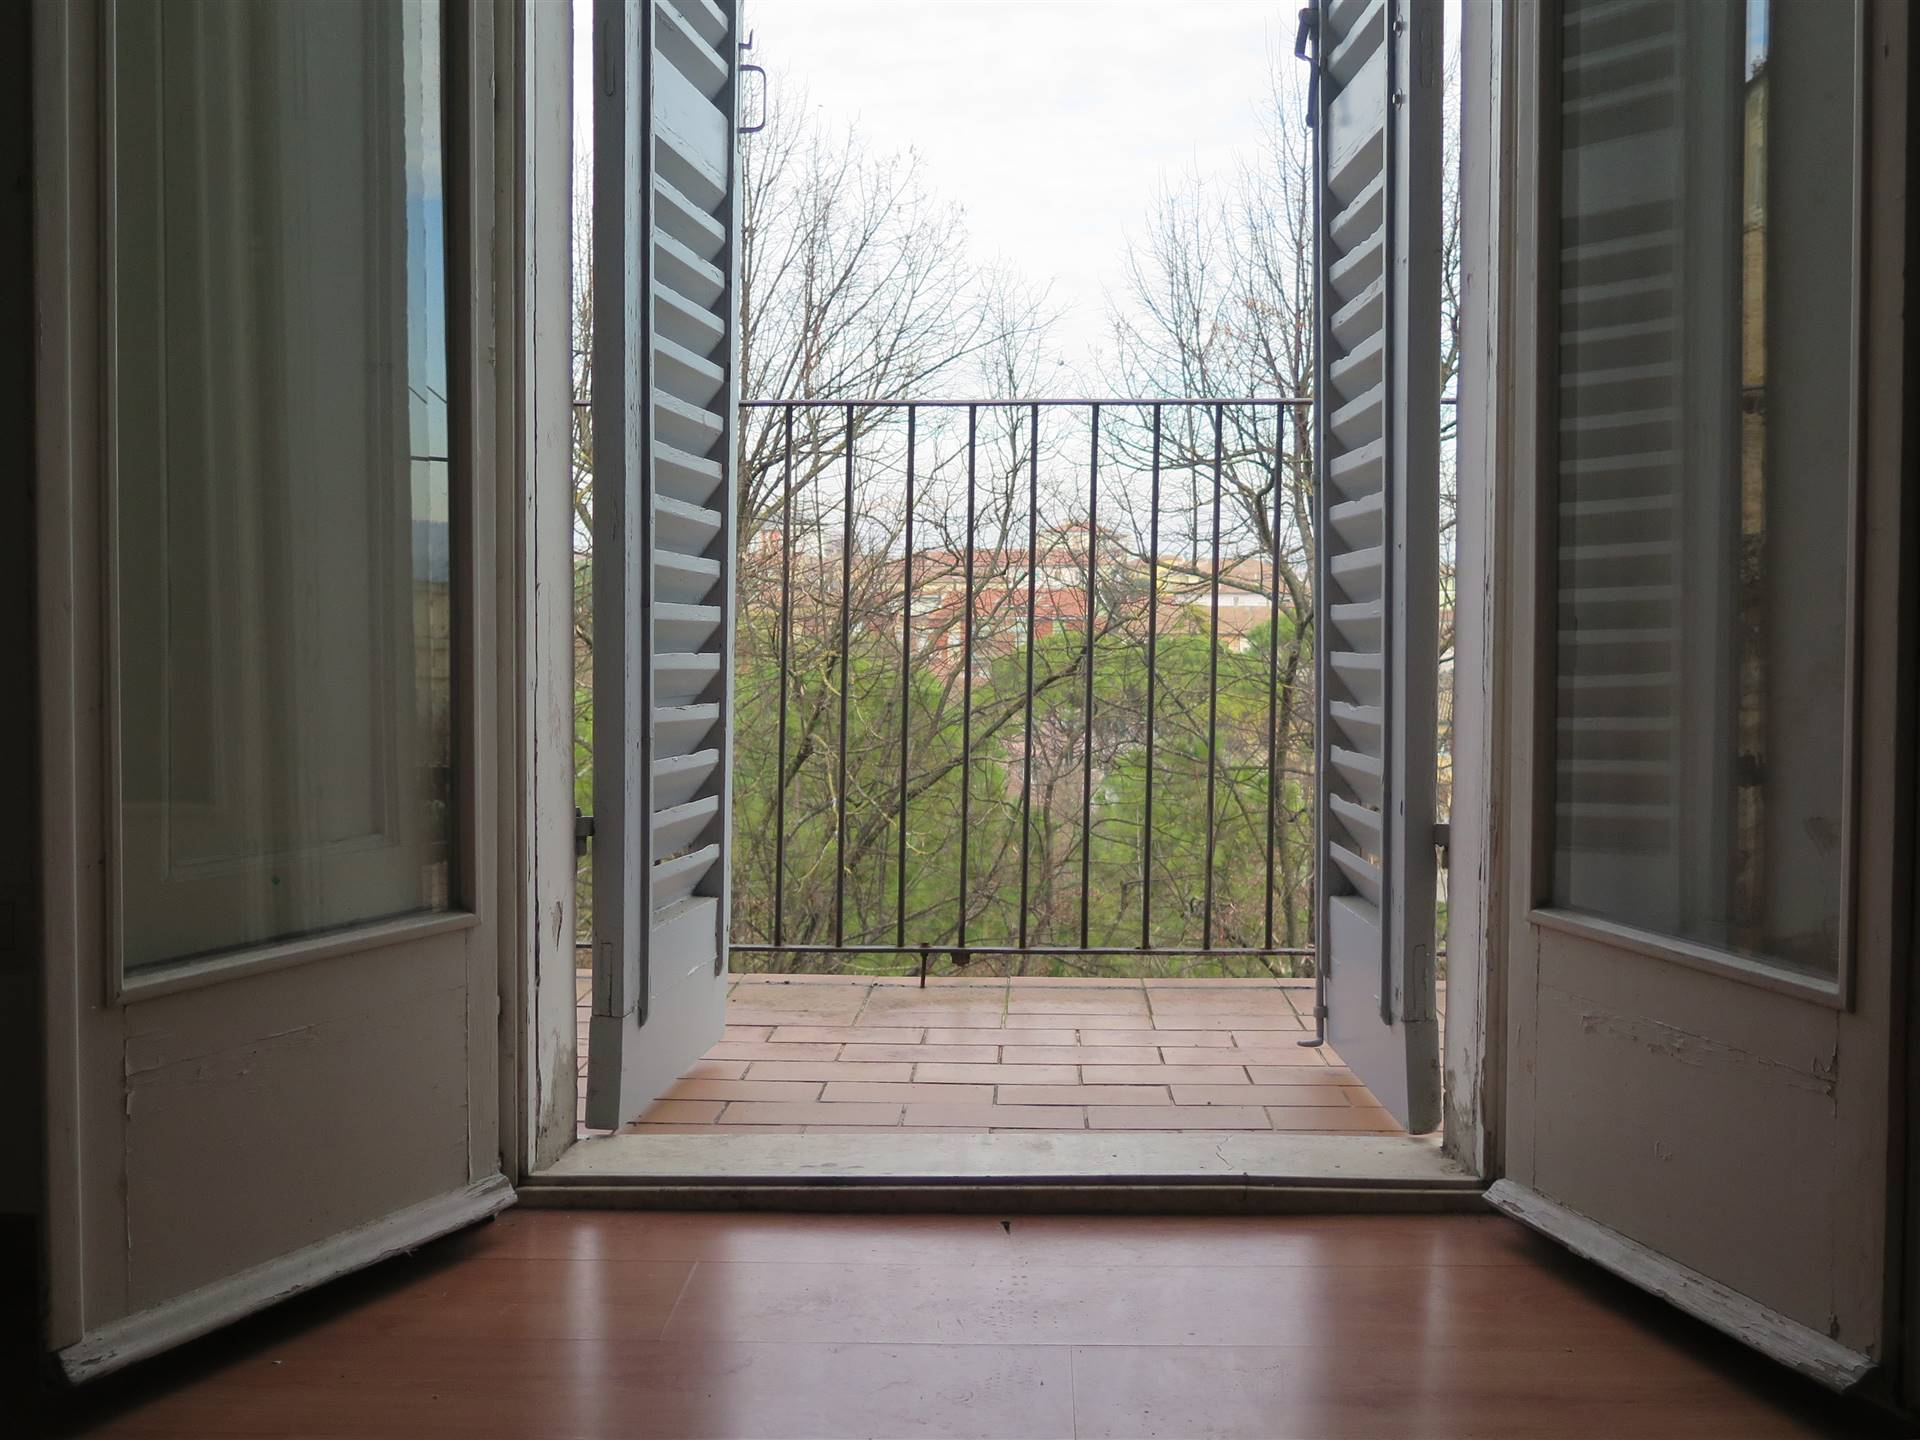 ambienti finestrati